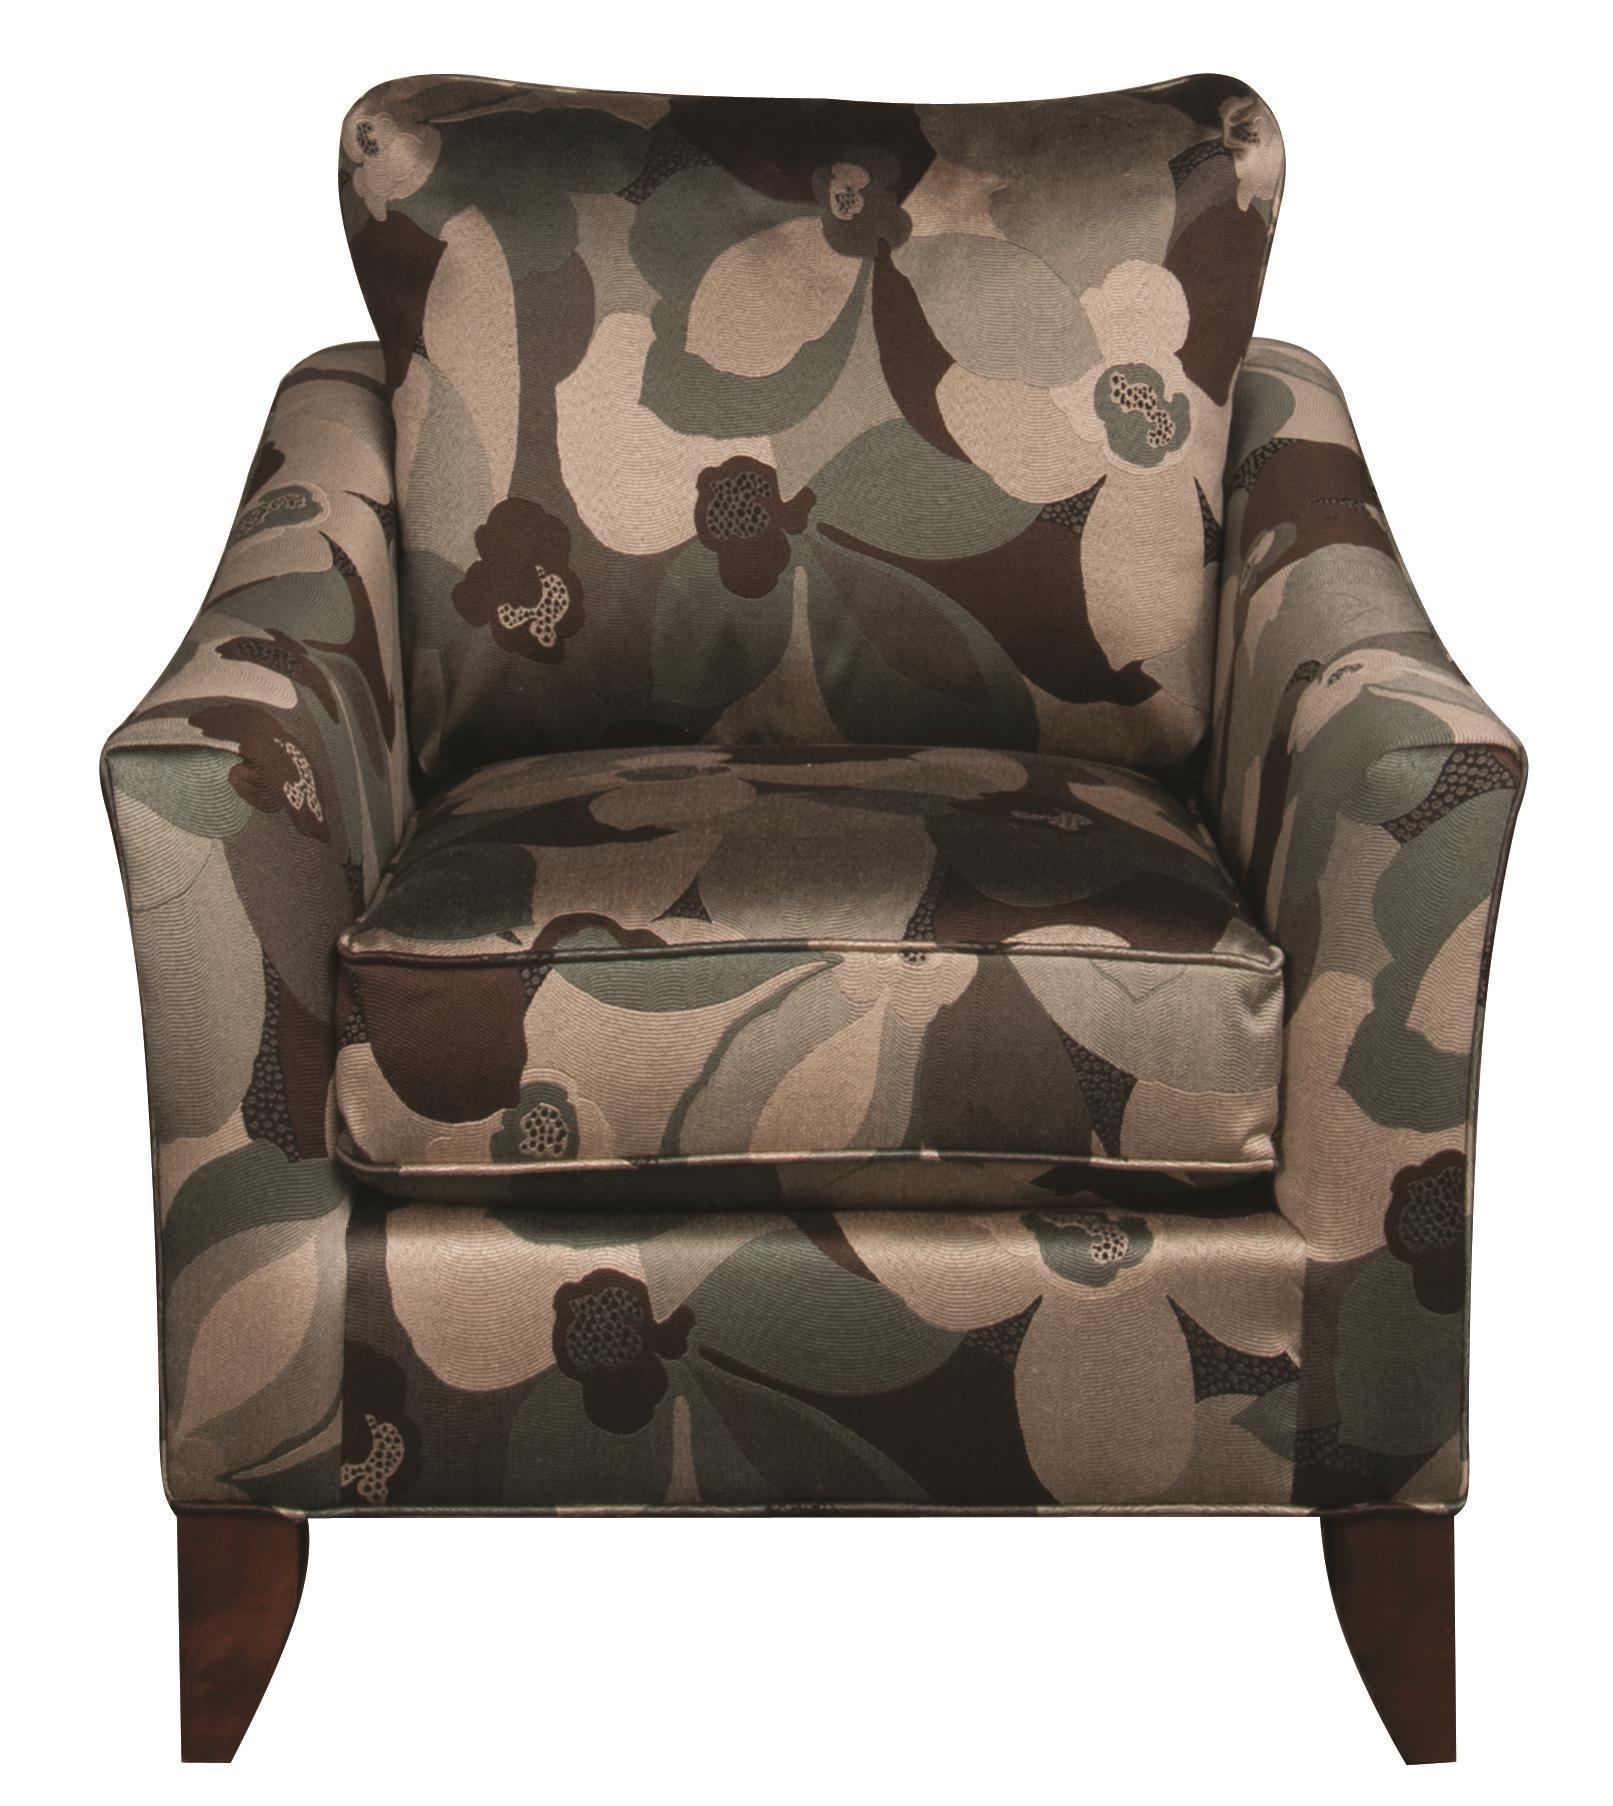 Morris Home Furnishings Brenda Brenda Accent Chair - Item Number: 106601841